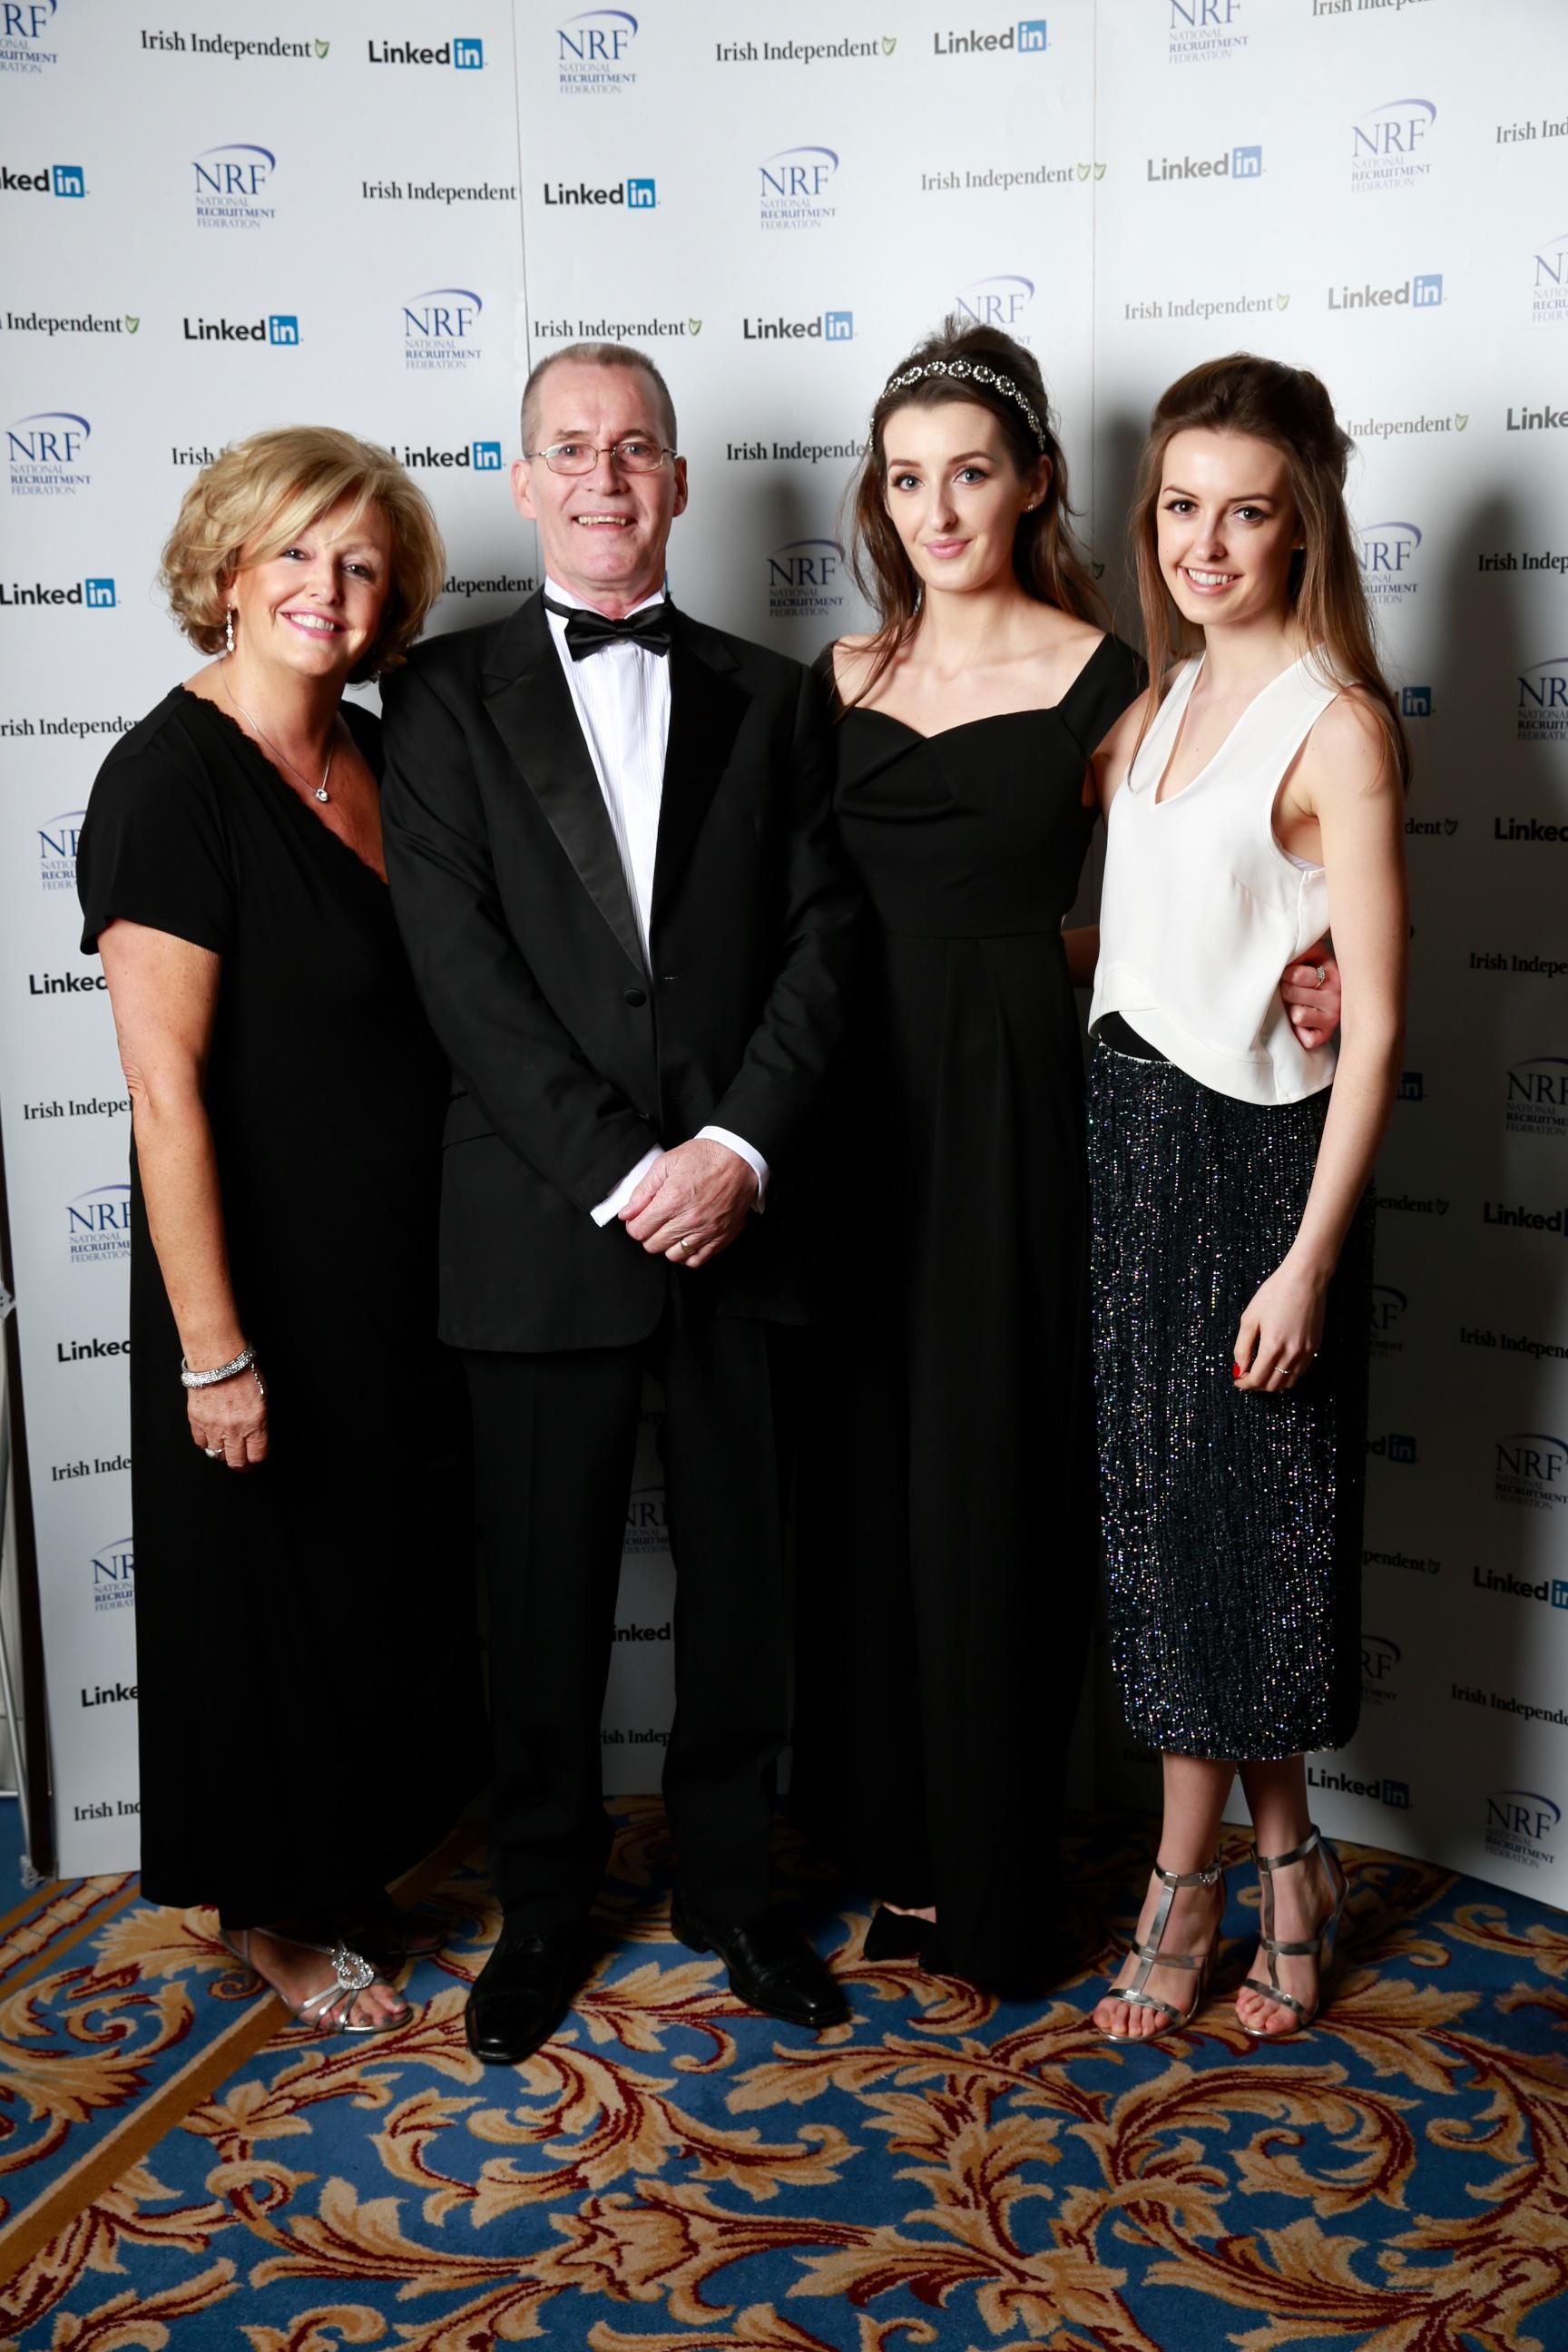 Barbara McGrath Tony Healy Olivia Keating and Ellen Keating at the NRF Awards